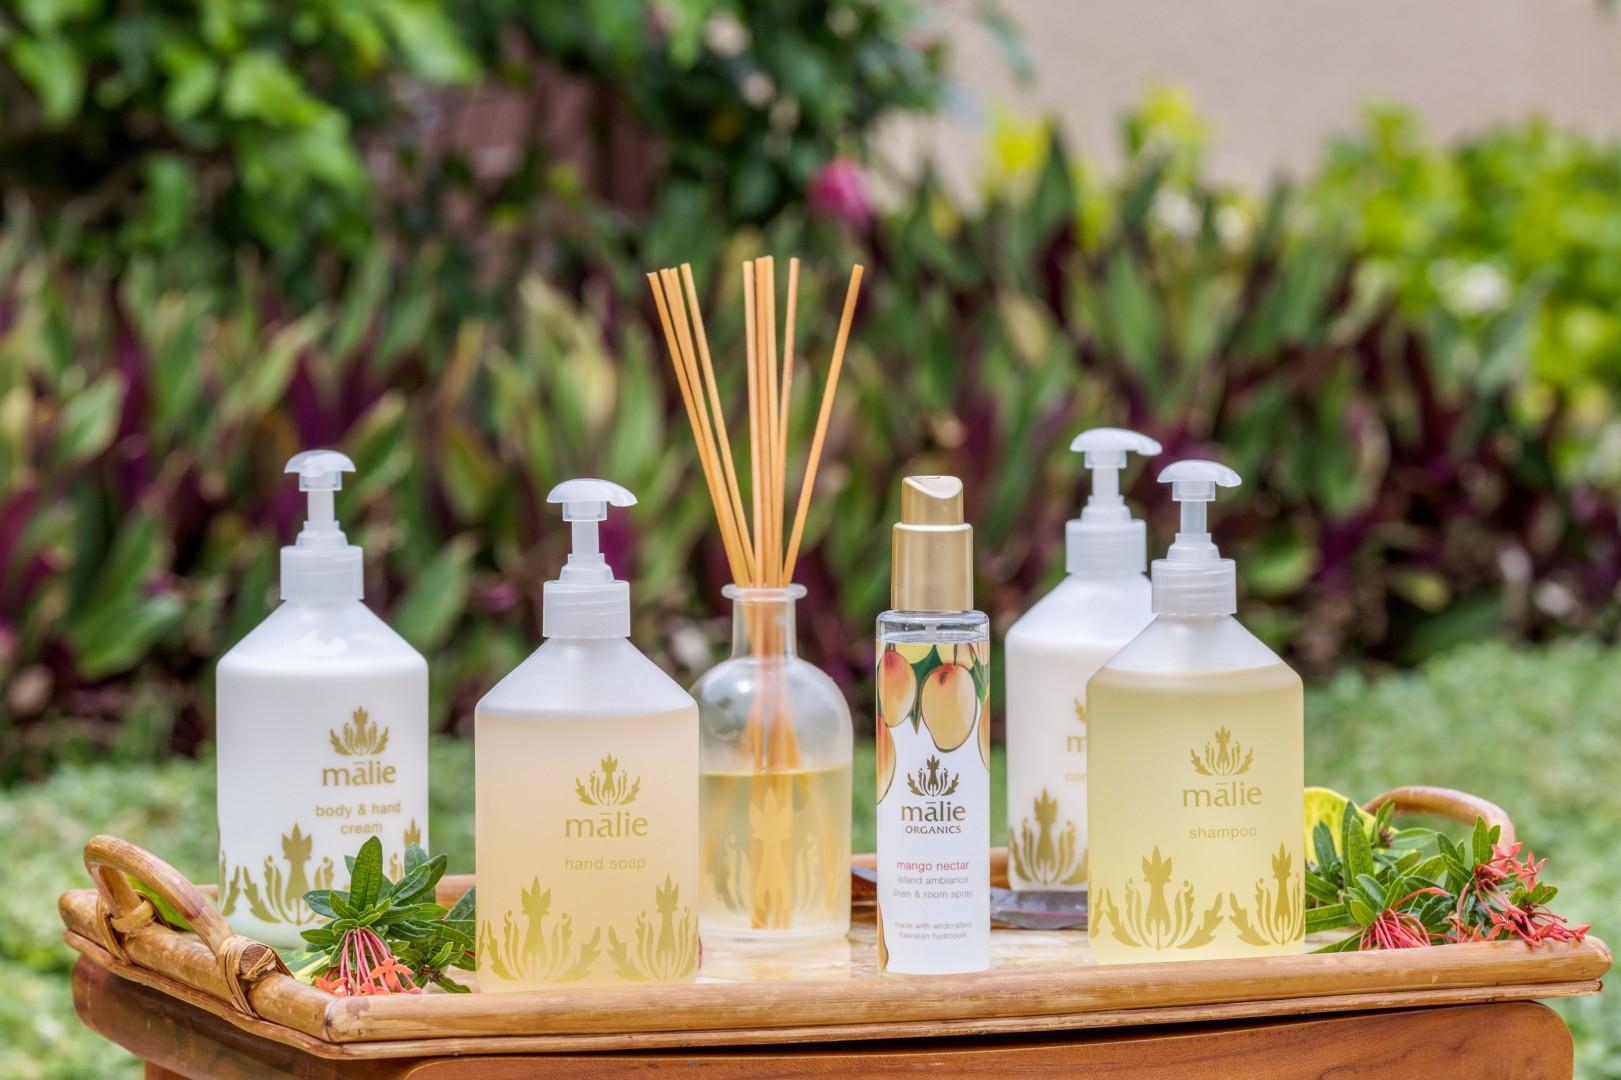 Luxurious Malie Organics Toiletries Supplied Throughout